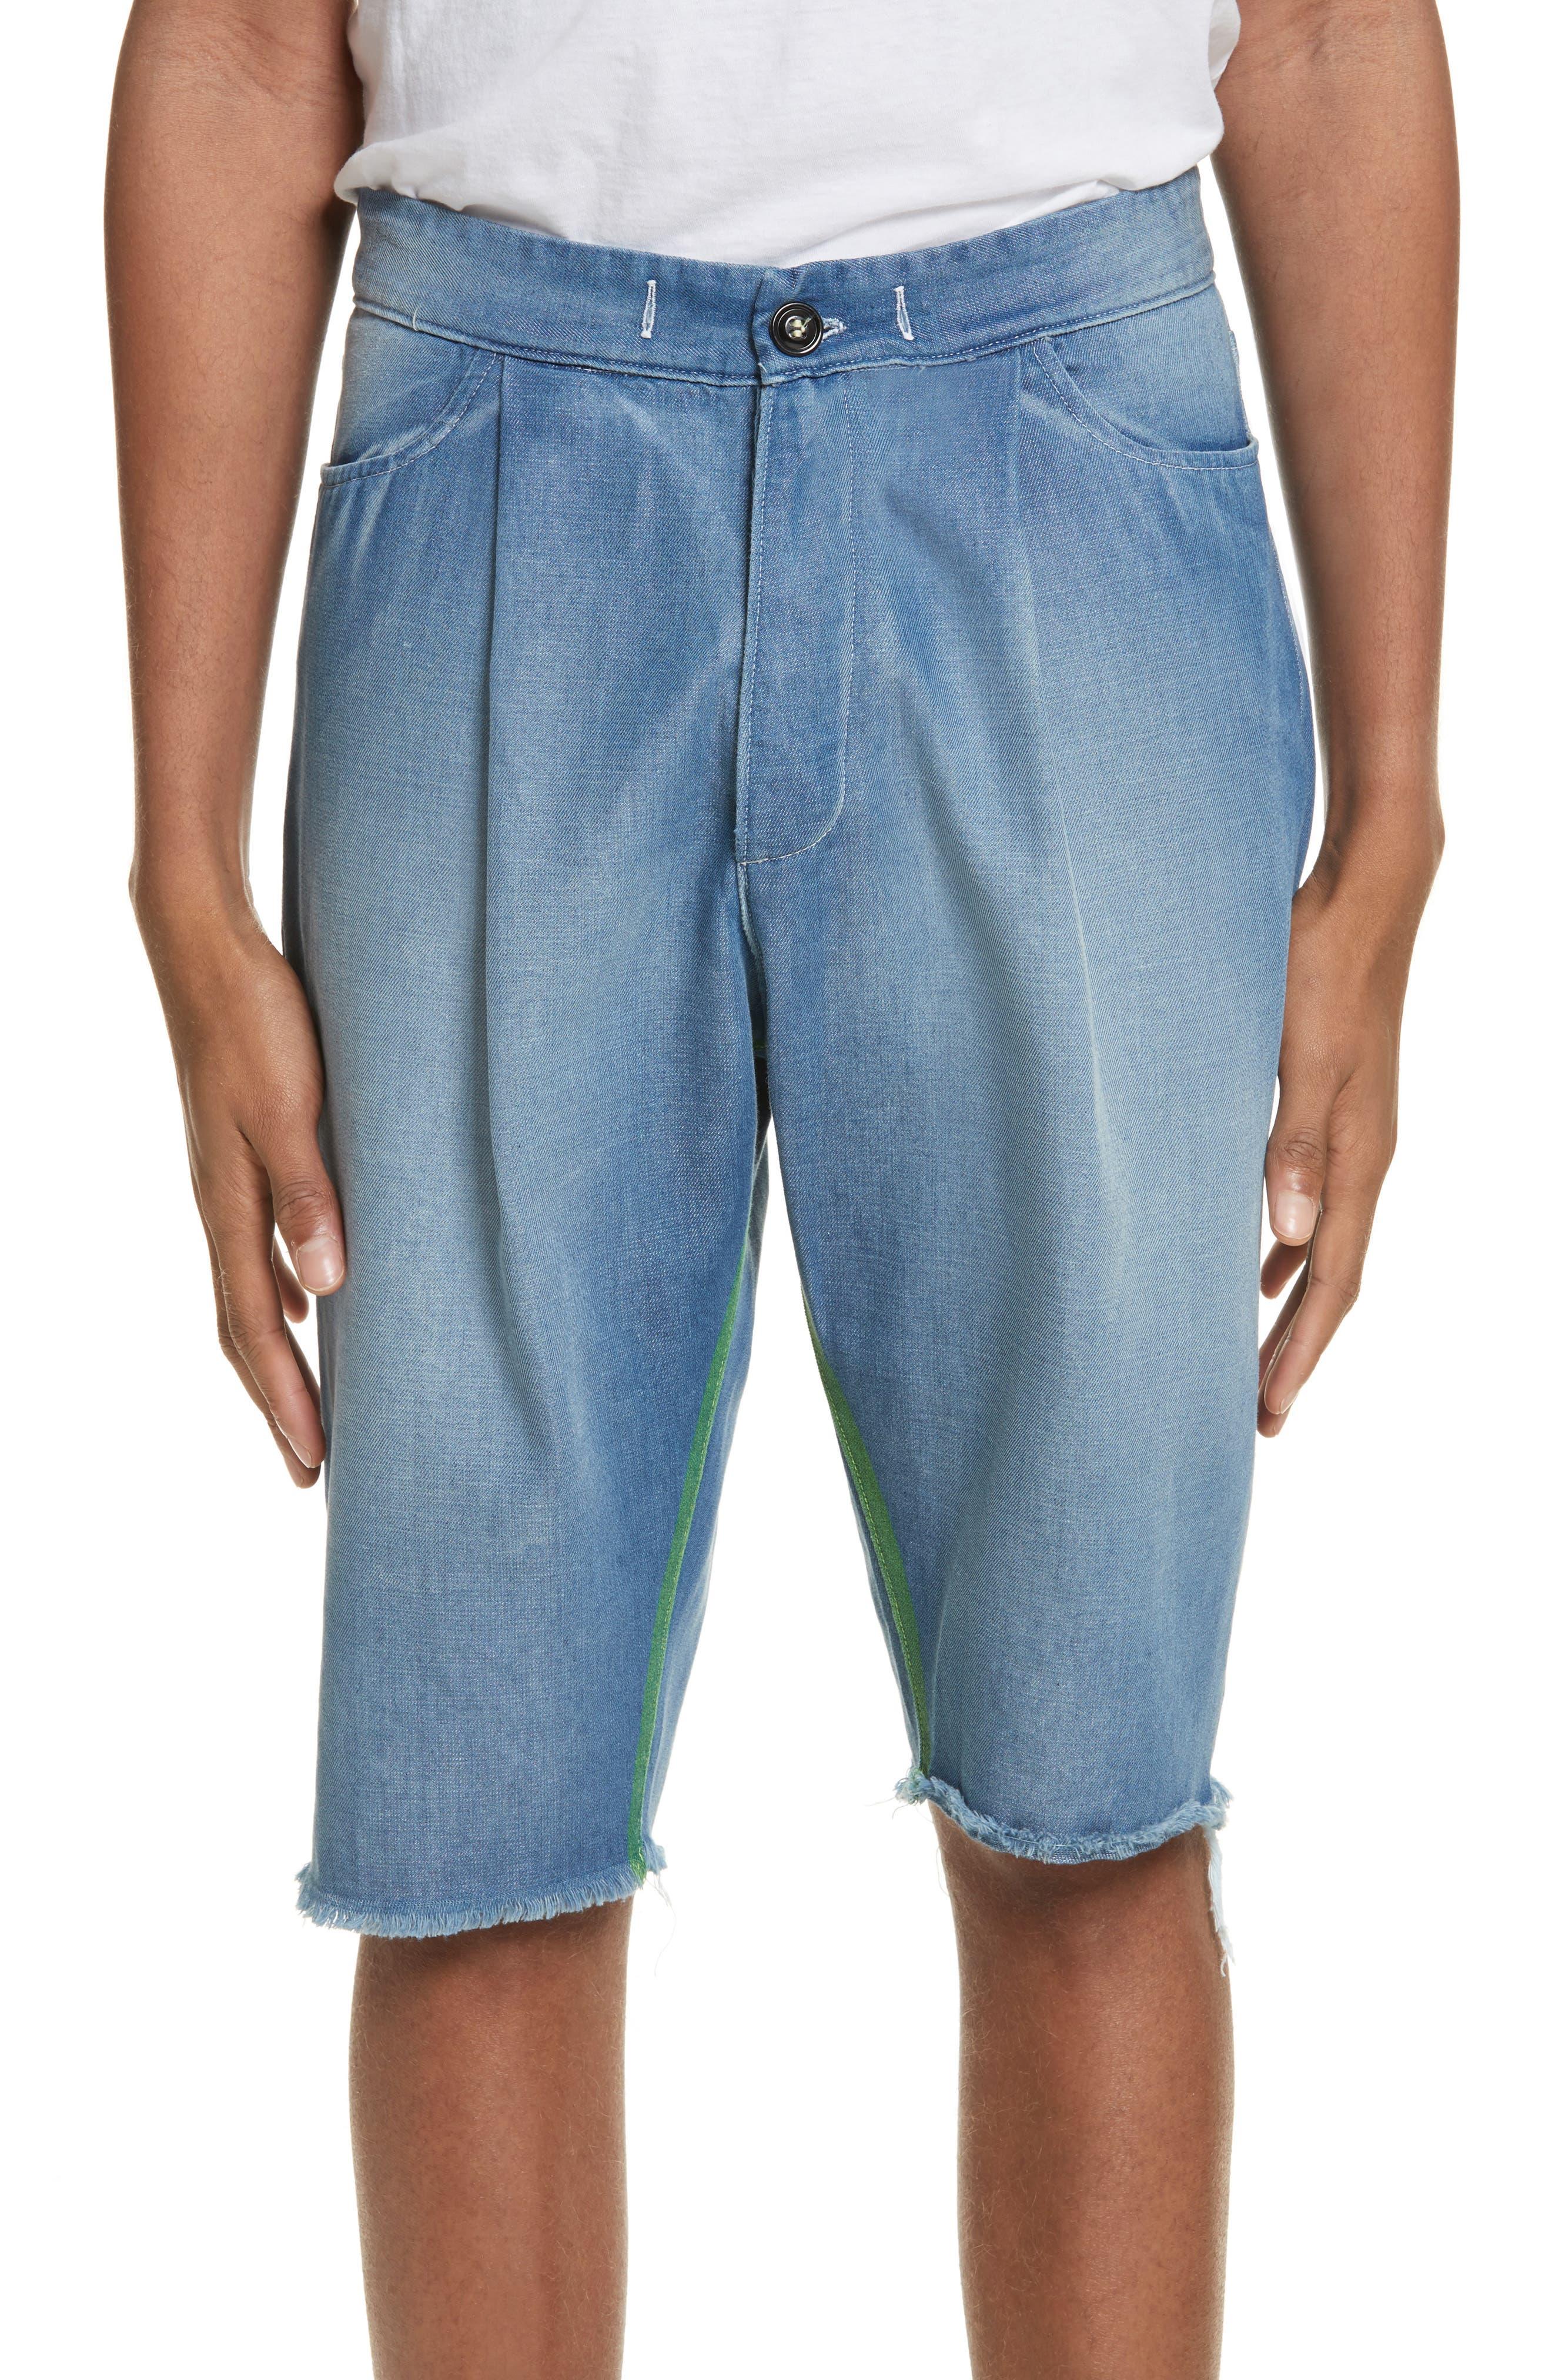 Drifter Tio Shorts